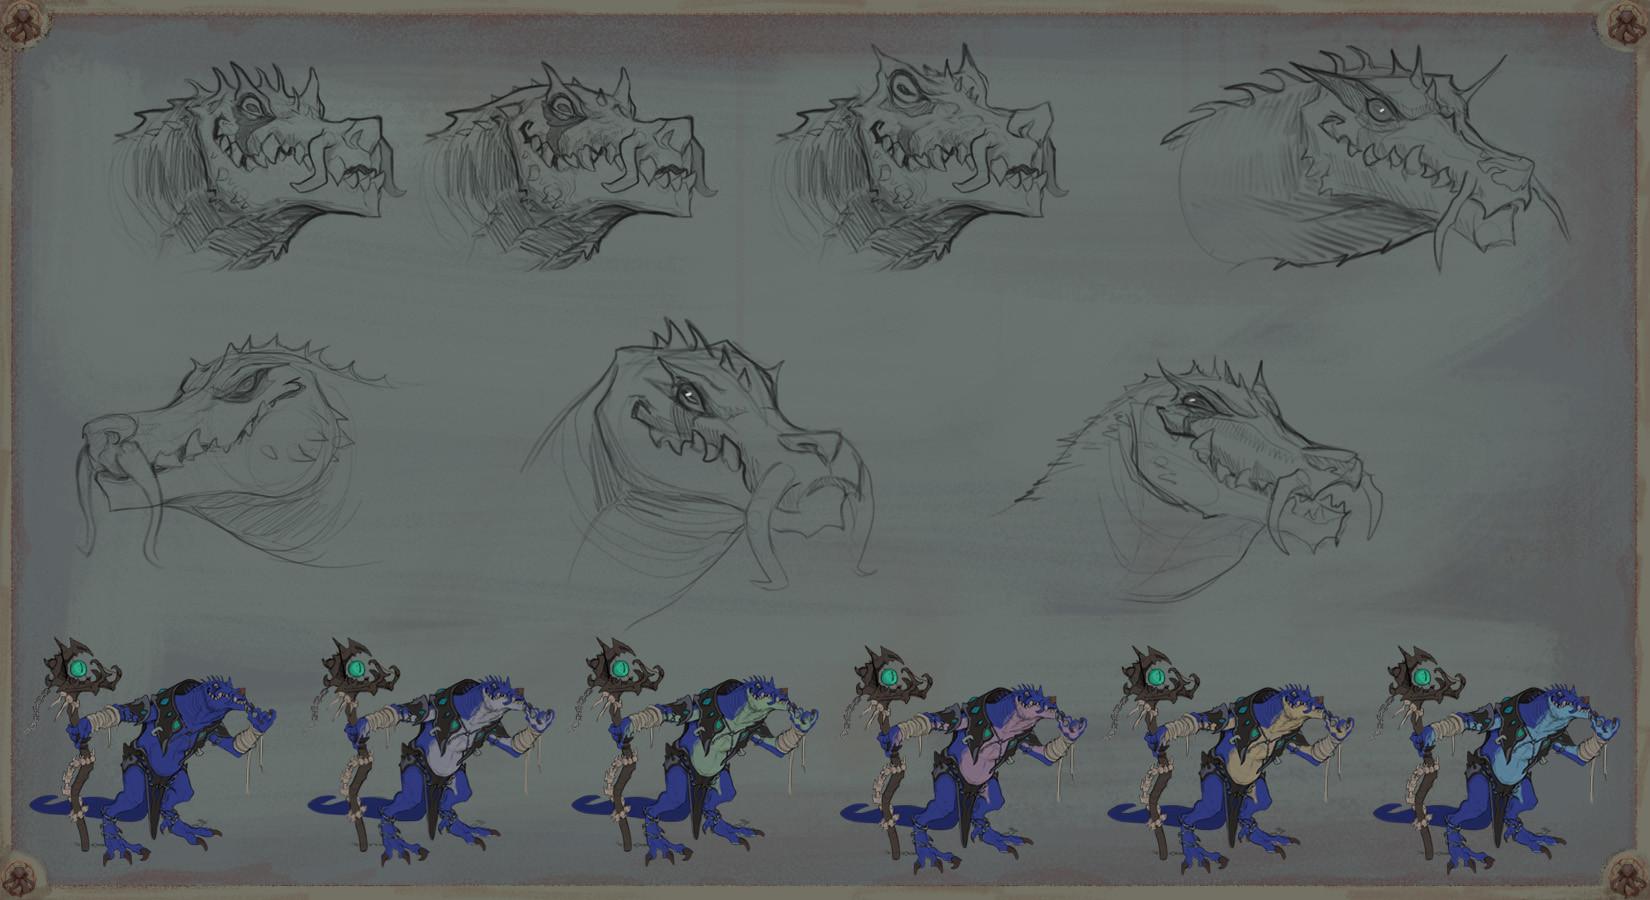 Cindy a avelino aldis warlock character studies 2